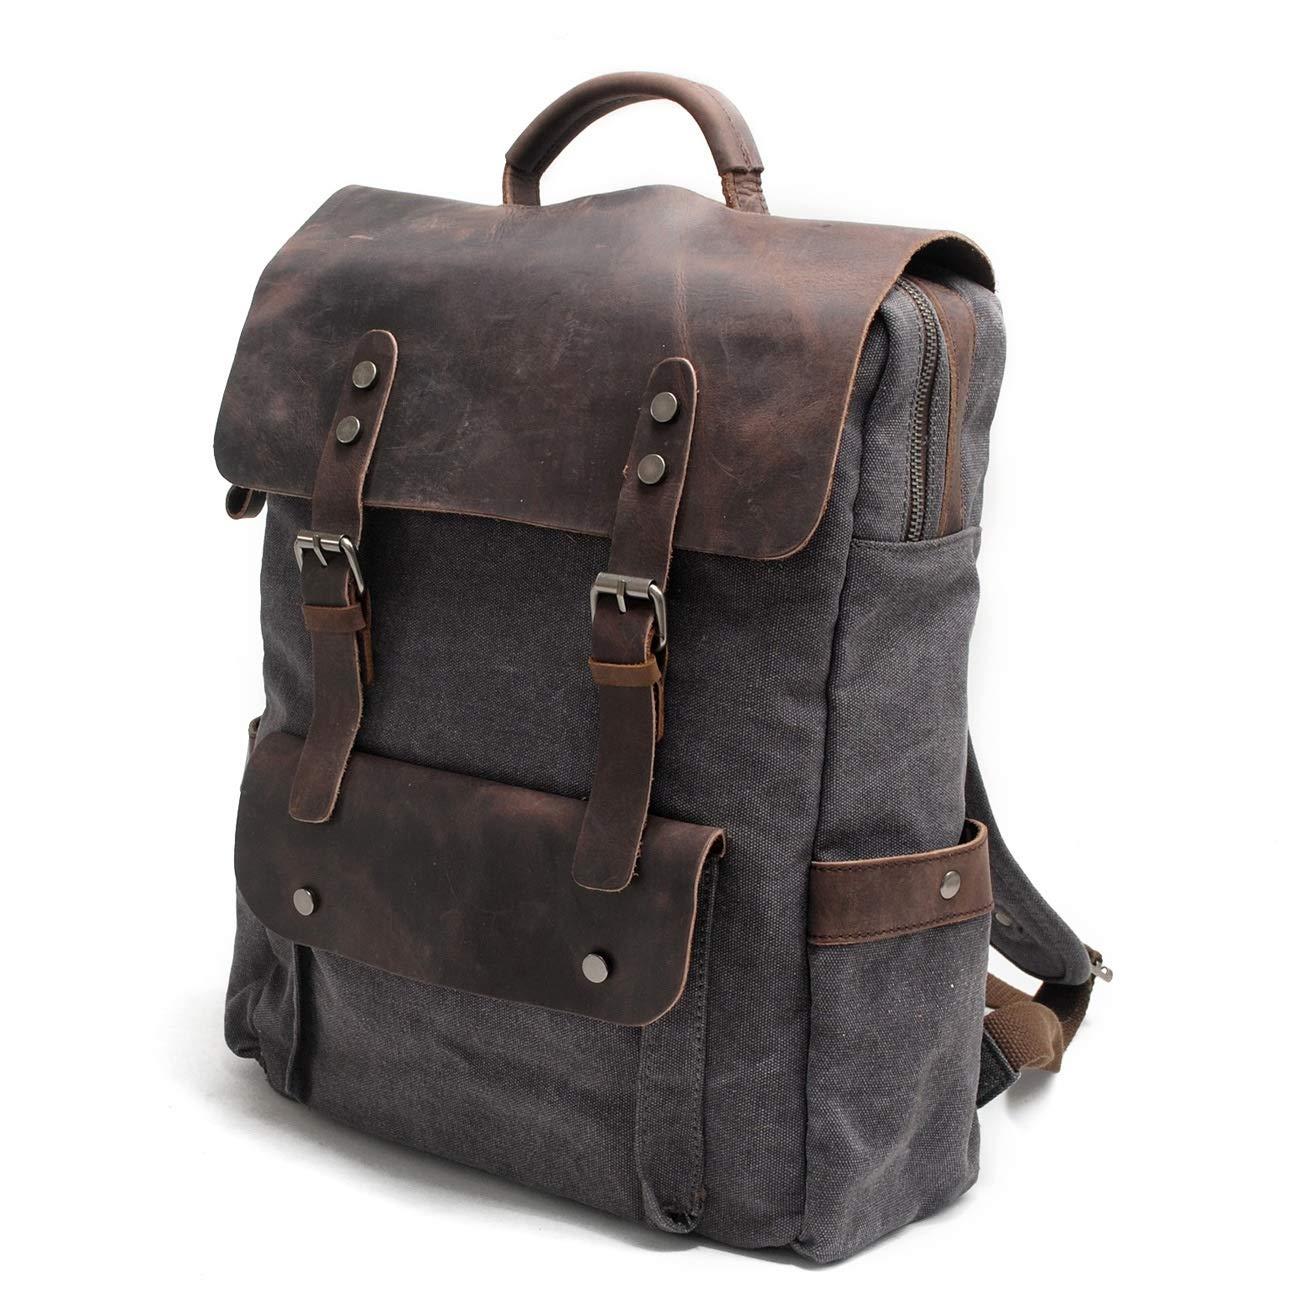 Asdflina Canvas Rucksack Rucksack Rucksack Mode Reiserucksack Schulrucksack Casual Vintage Daypack Lässig Unisex Rucksack Satchel Bookbag (Farbe   Dunkelgrau) B07PZYNG7S Daypacks Kunde zuerst 52c458